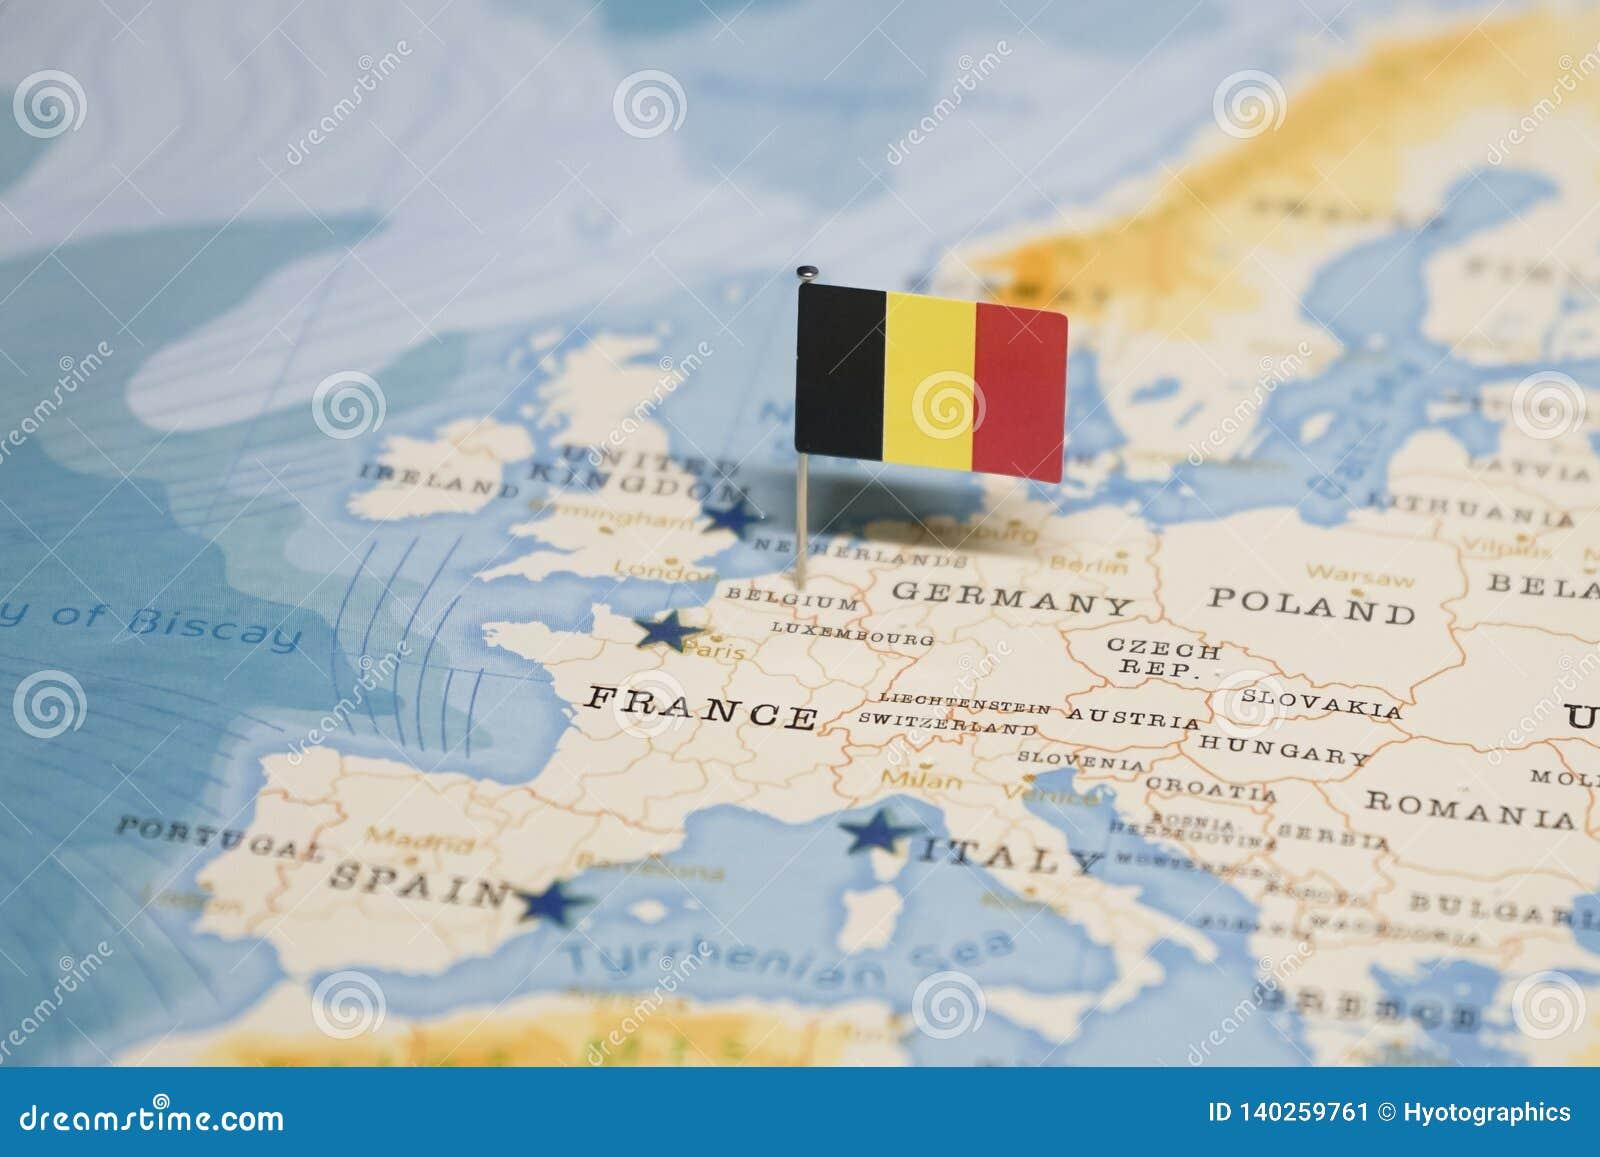 belgique carte du monde